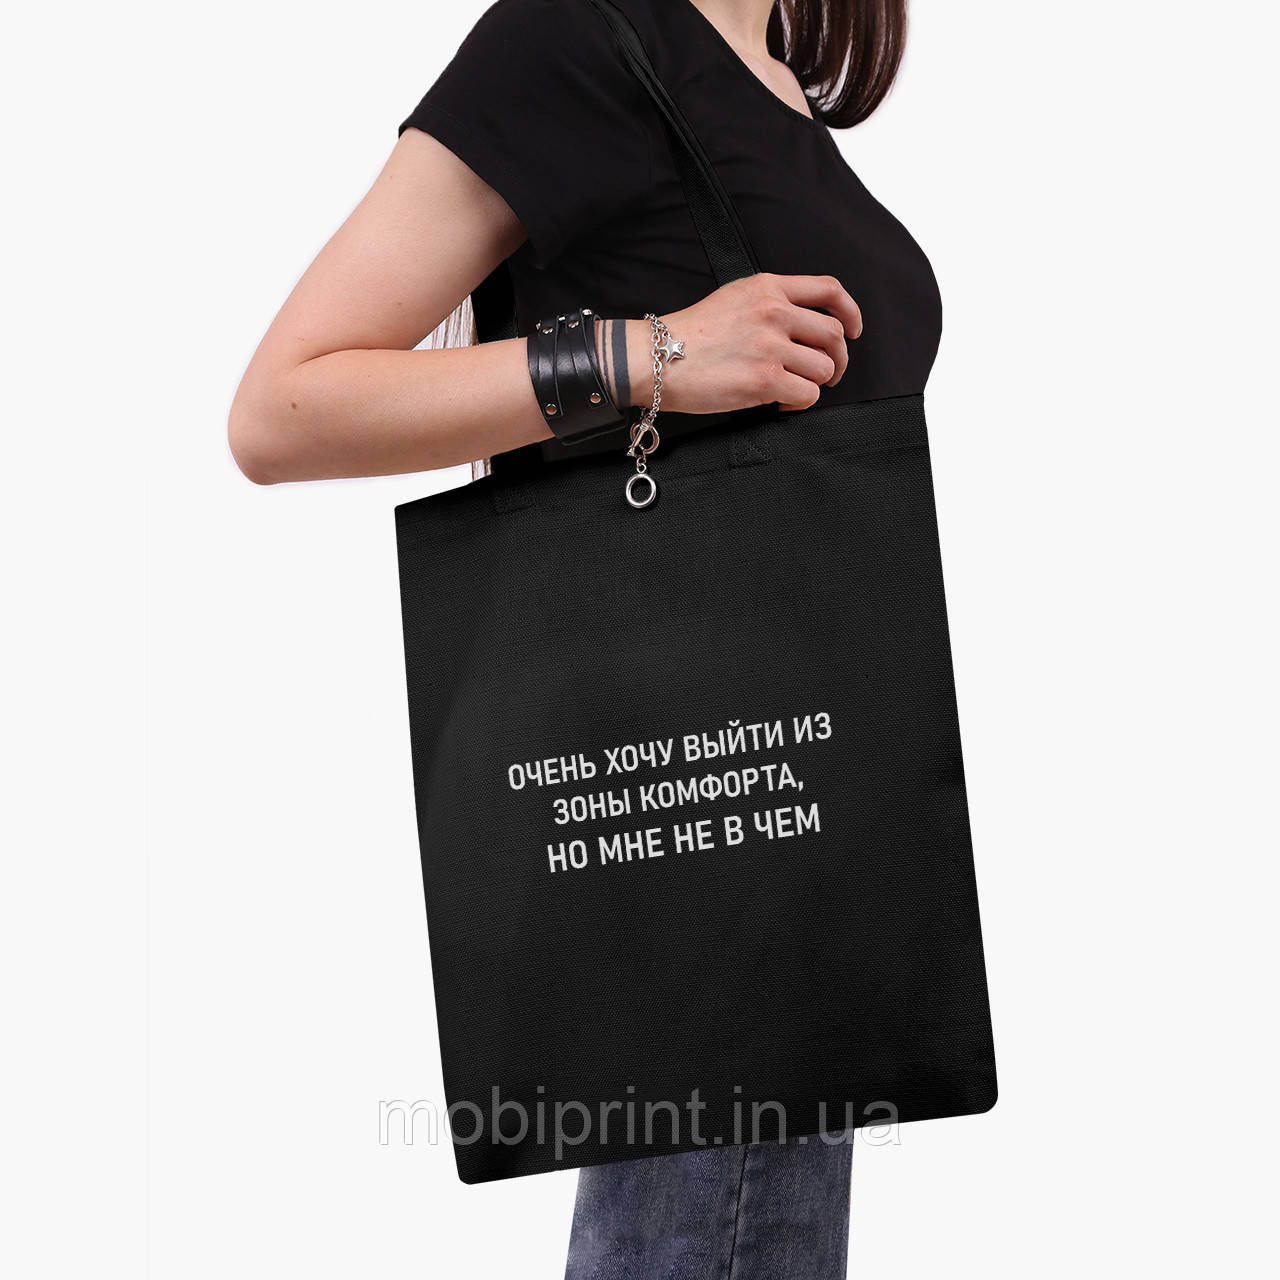 Еко сумка шоппер чорна Зона комфорту (Comfort zone) (9227-1780-2) экосумка шопер 41*35 см